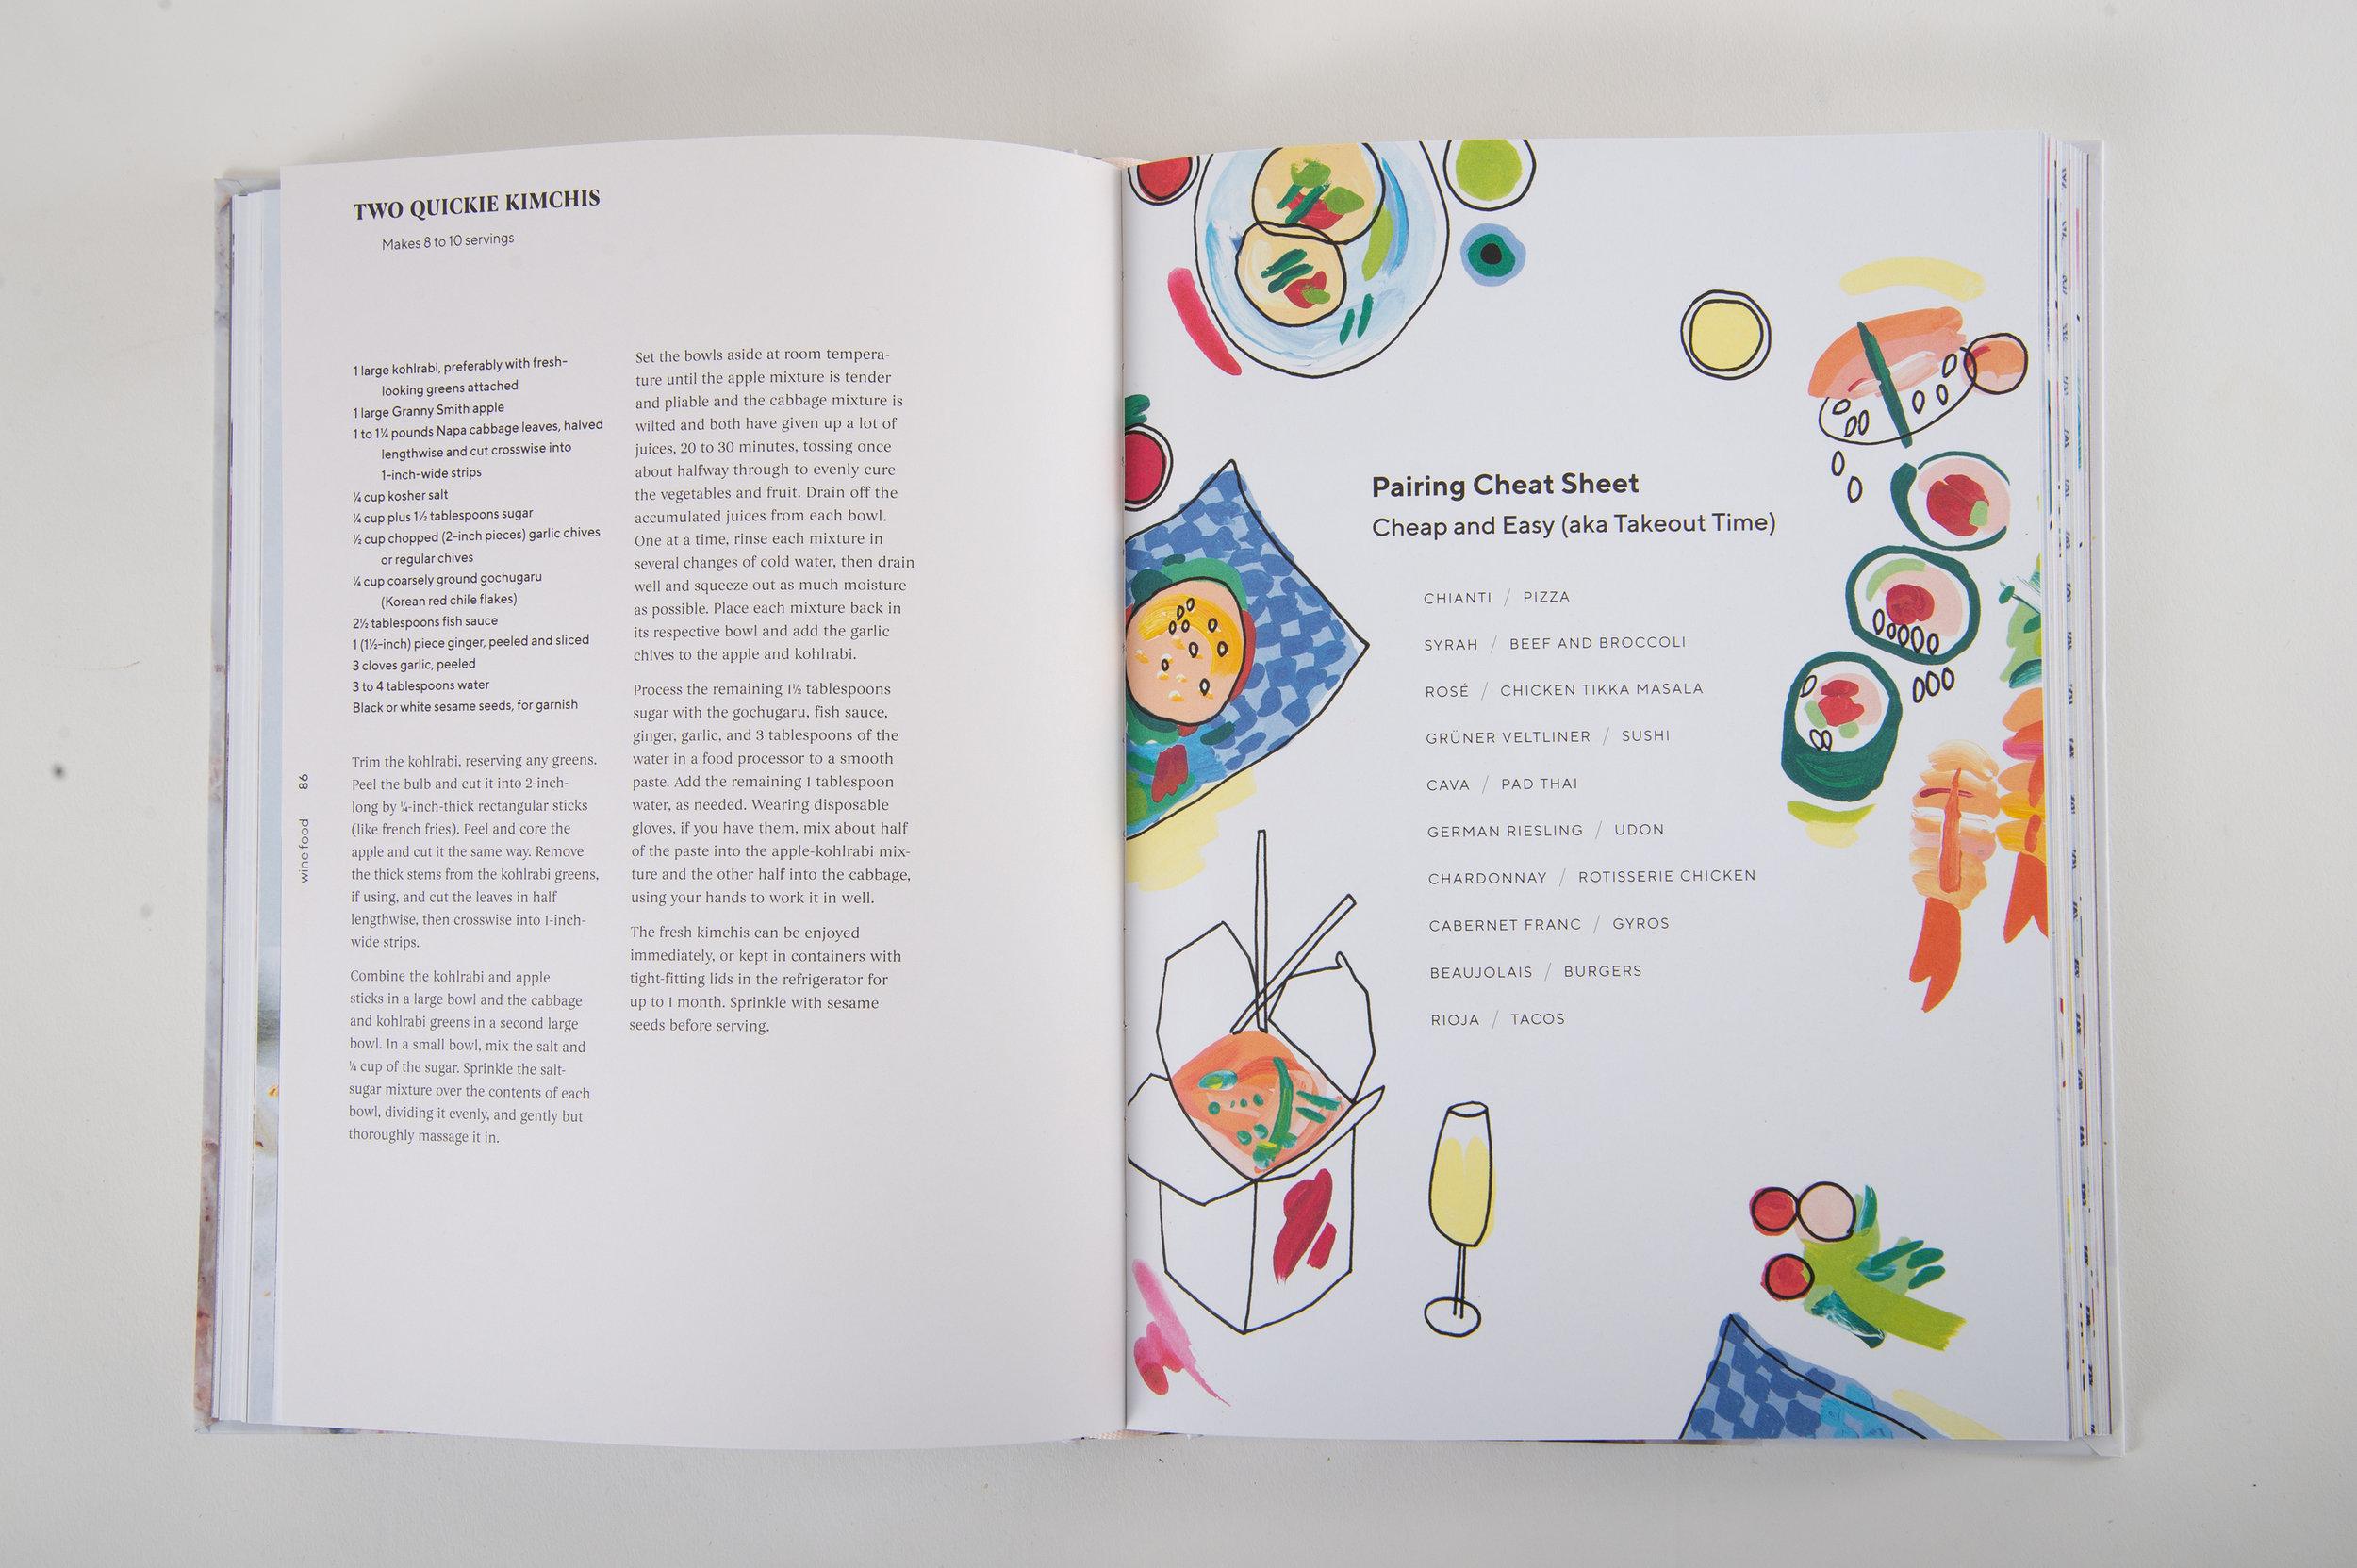 cookbook cheap and easy shot.jpg